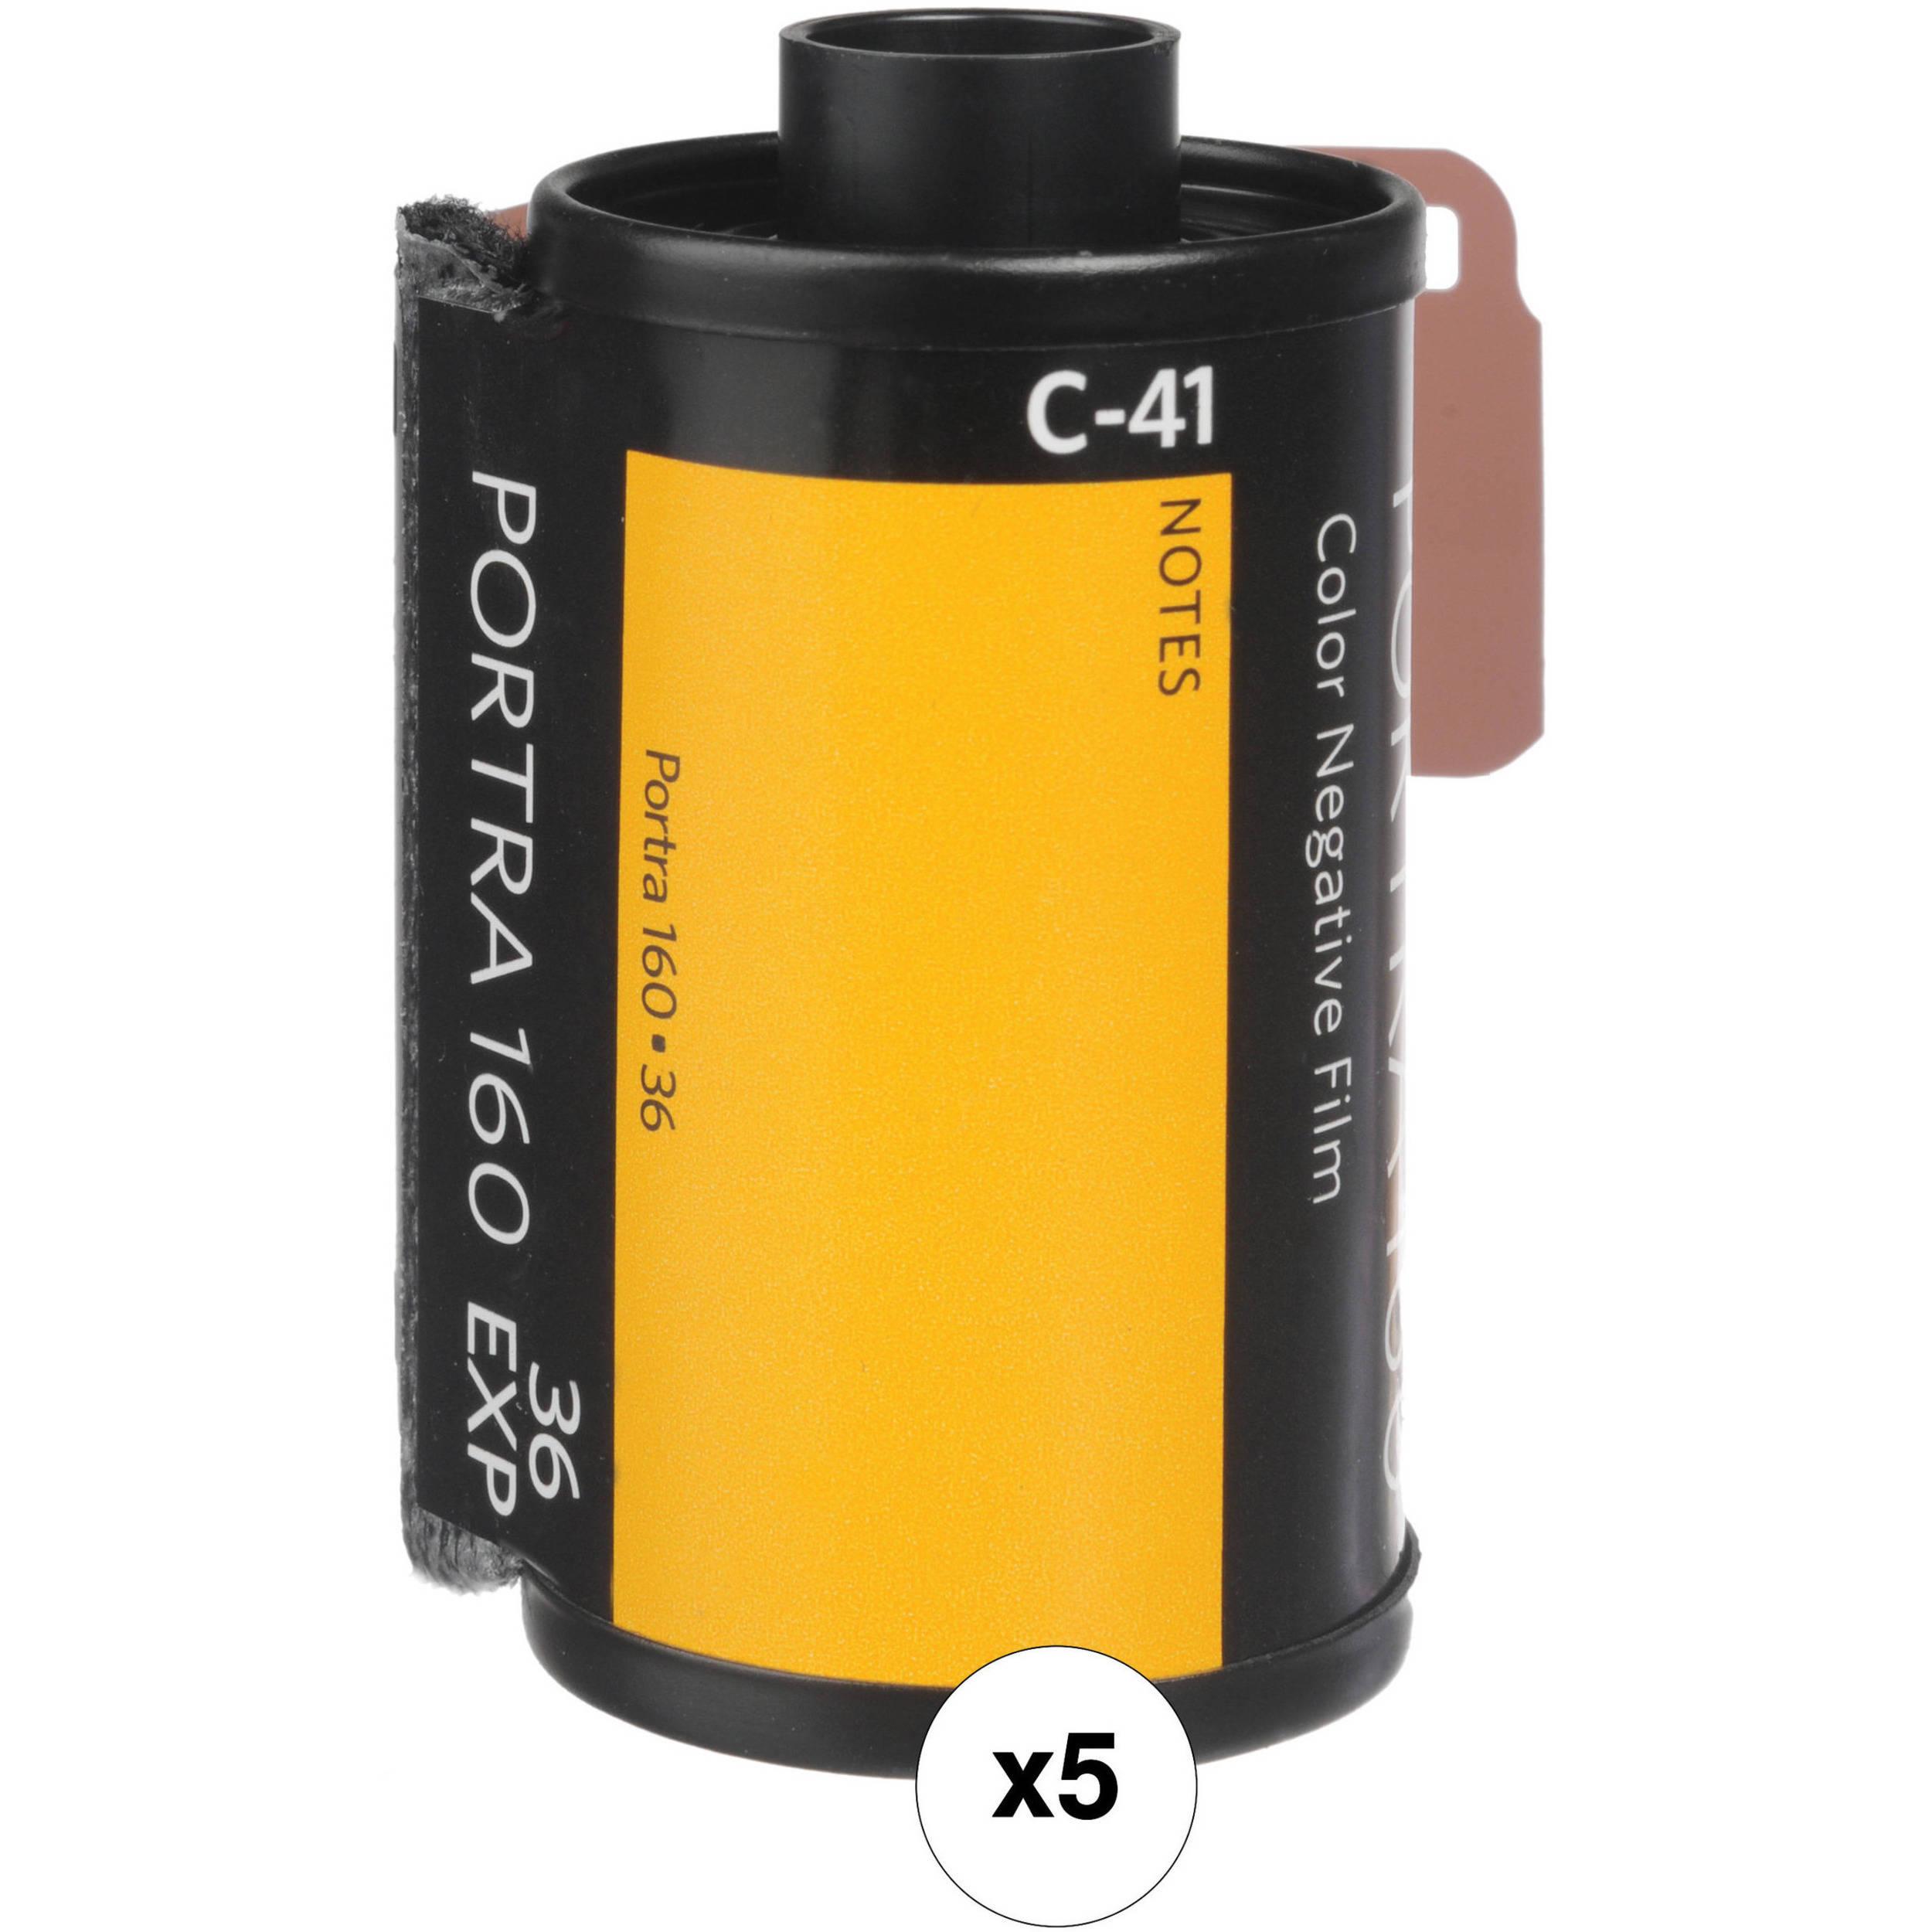 kodak portra 160 35mm review